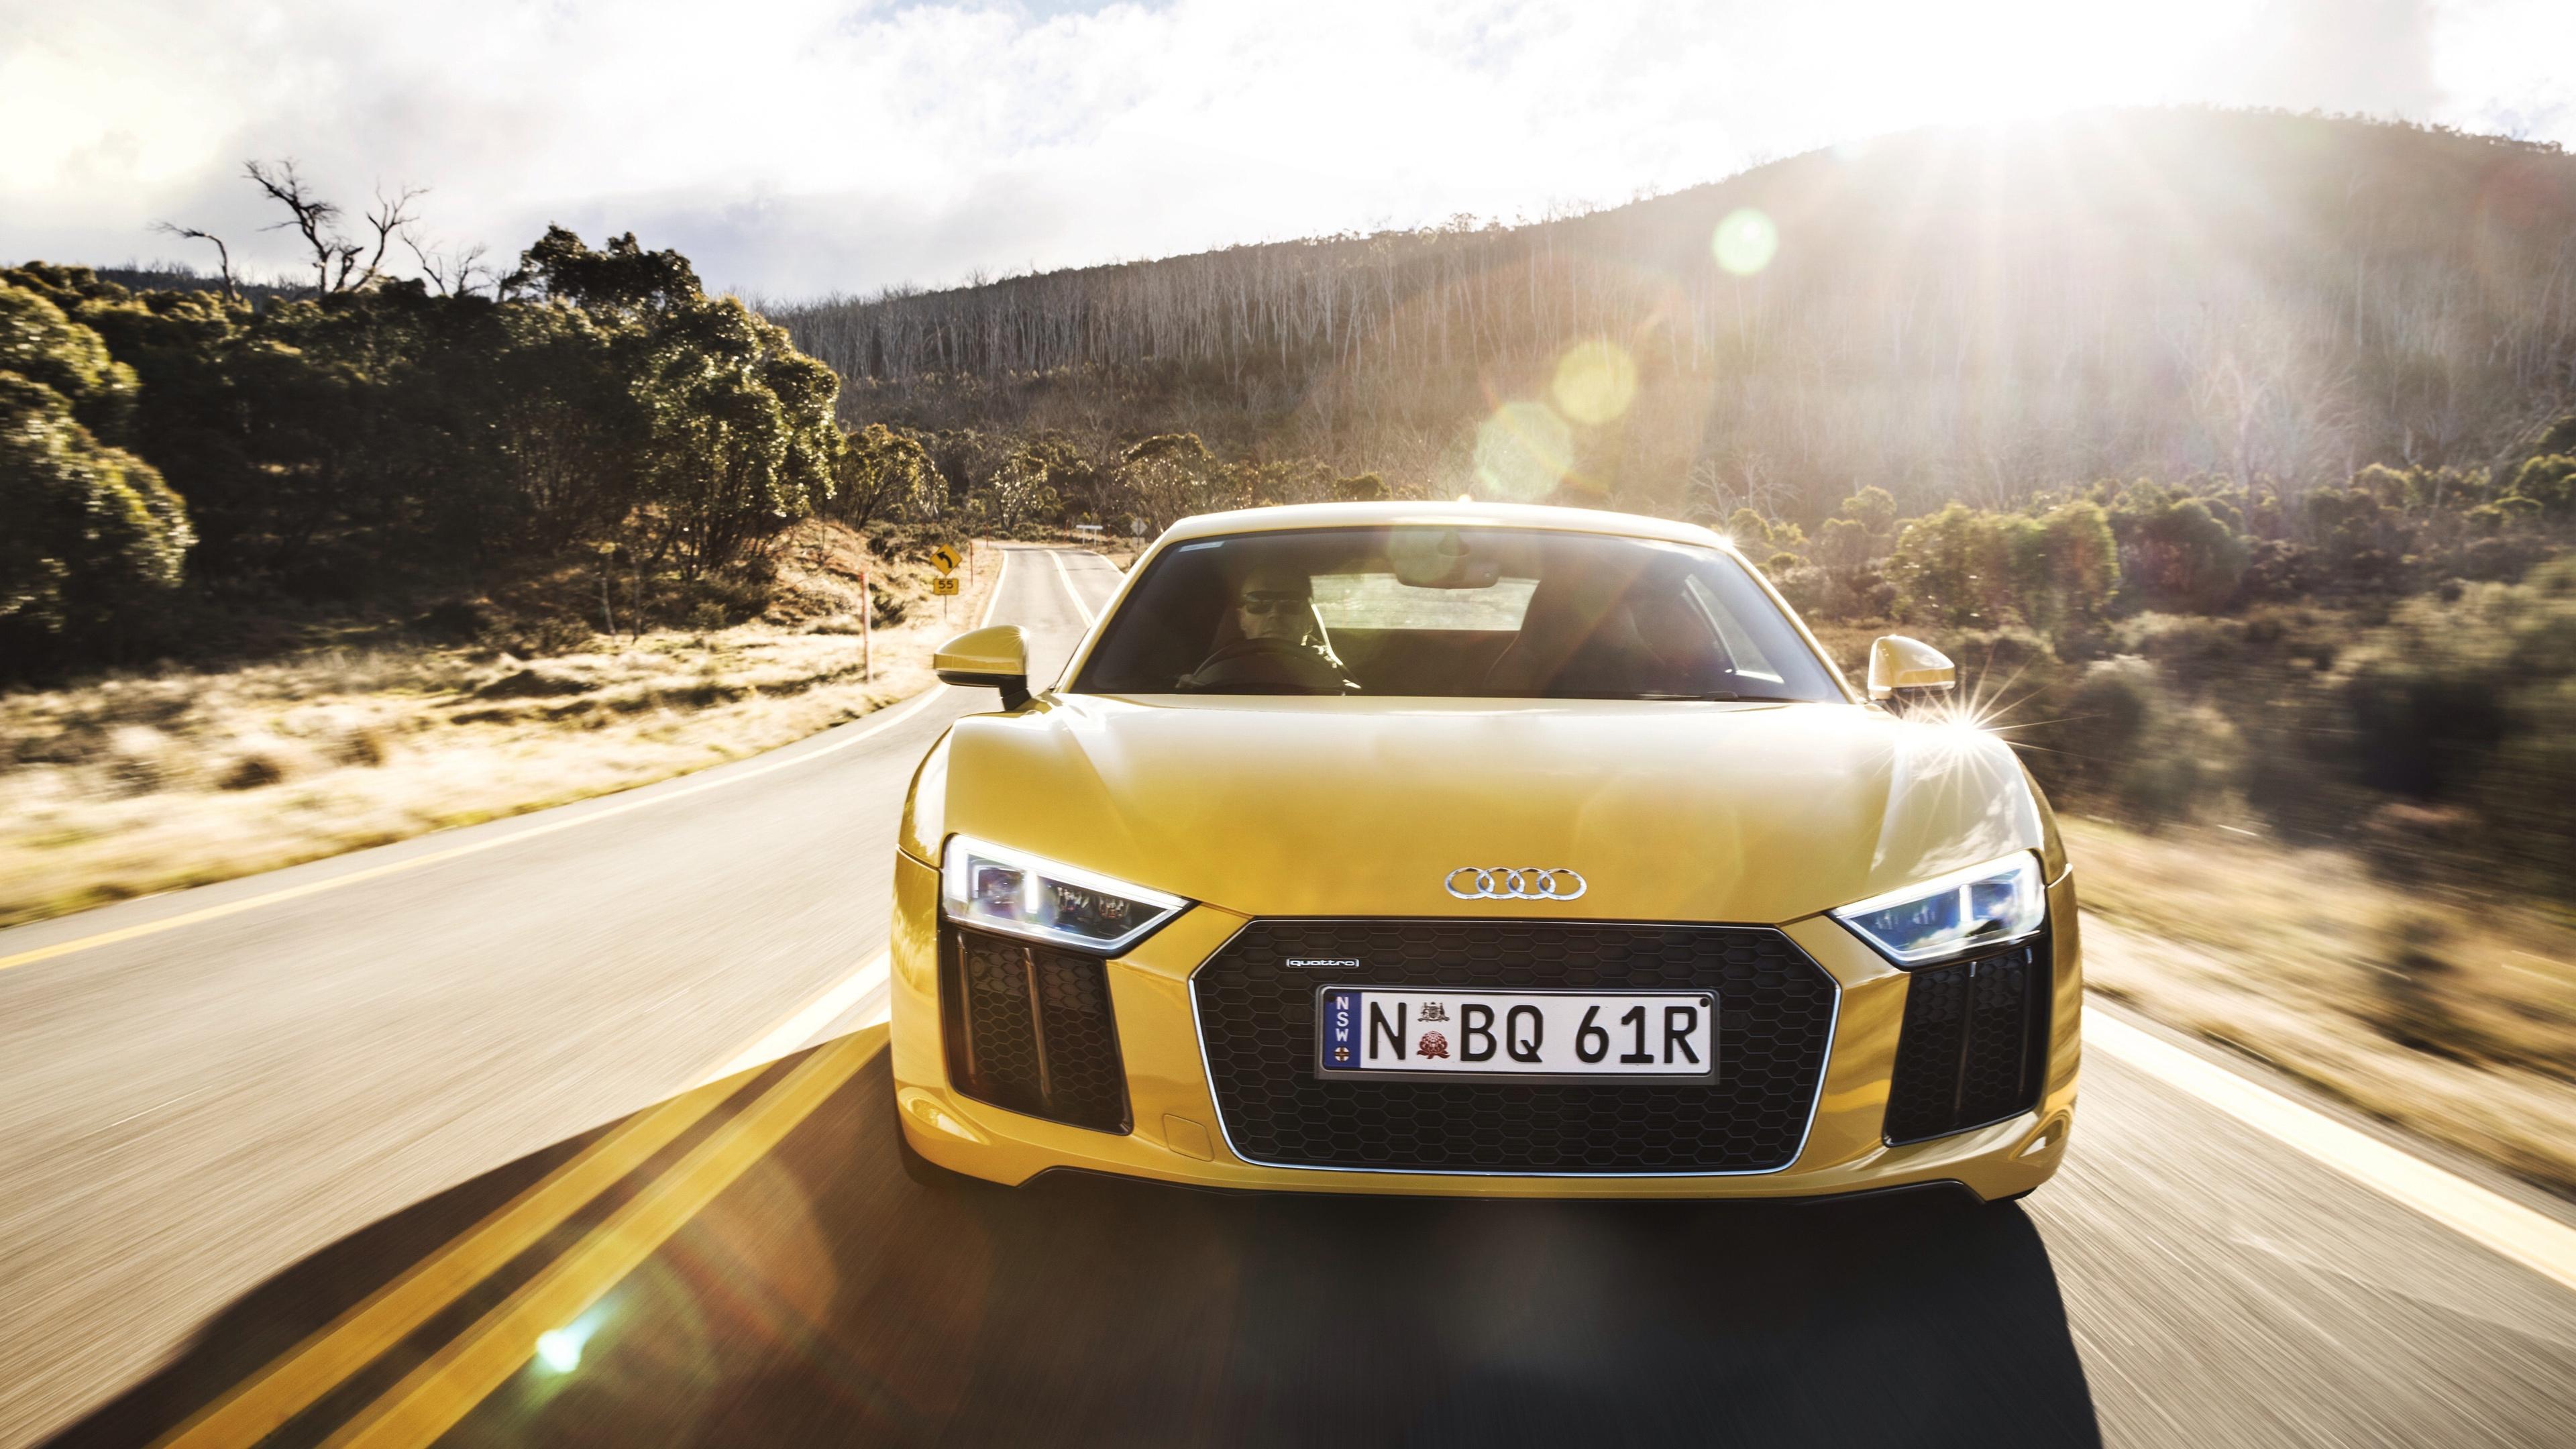 Audi R8 2016 Wallpaper Hd Car Wallpapers Id 6810